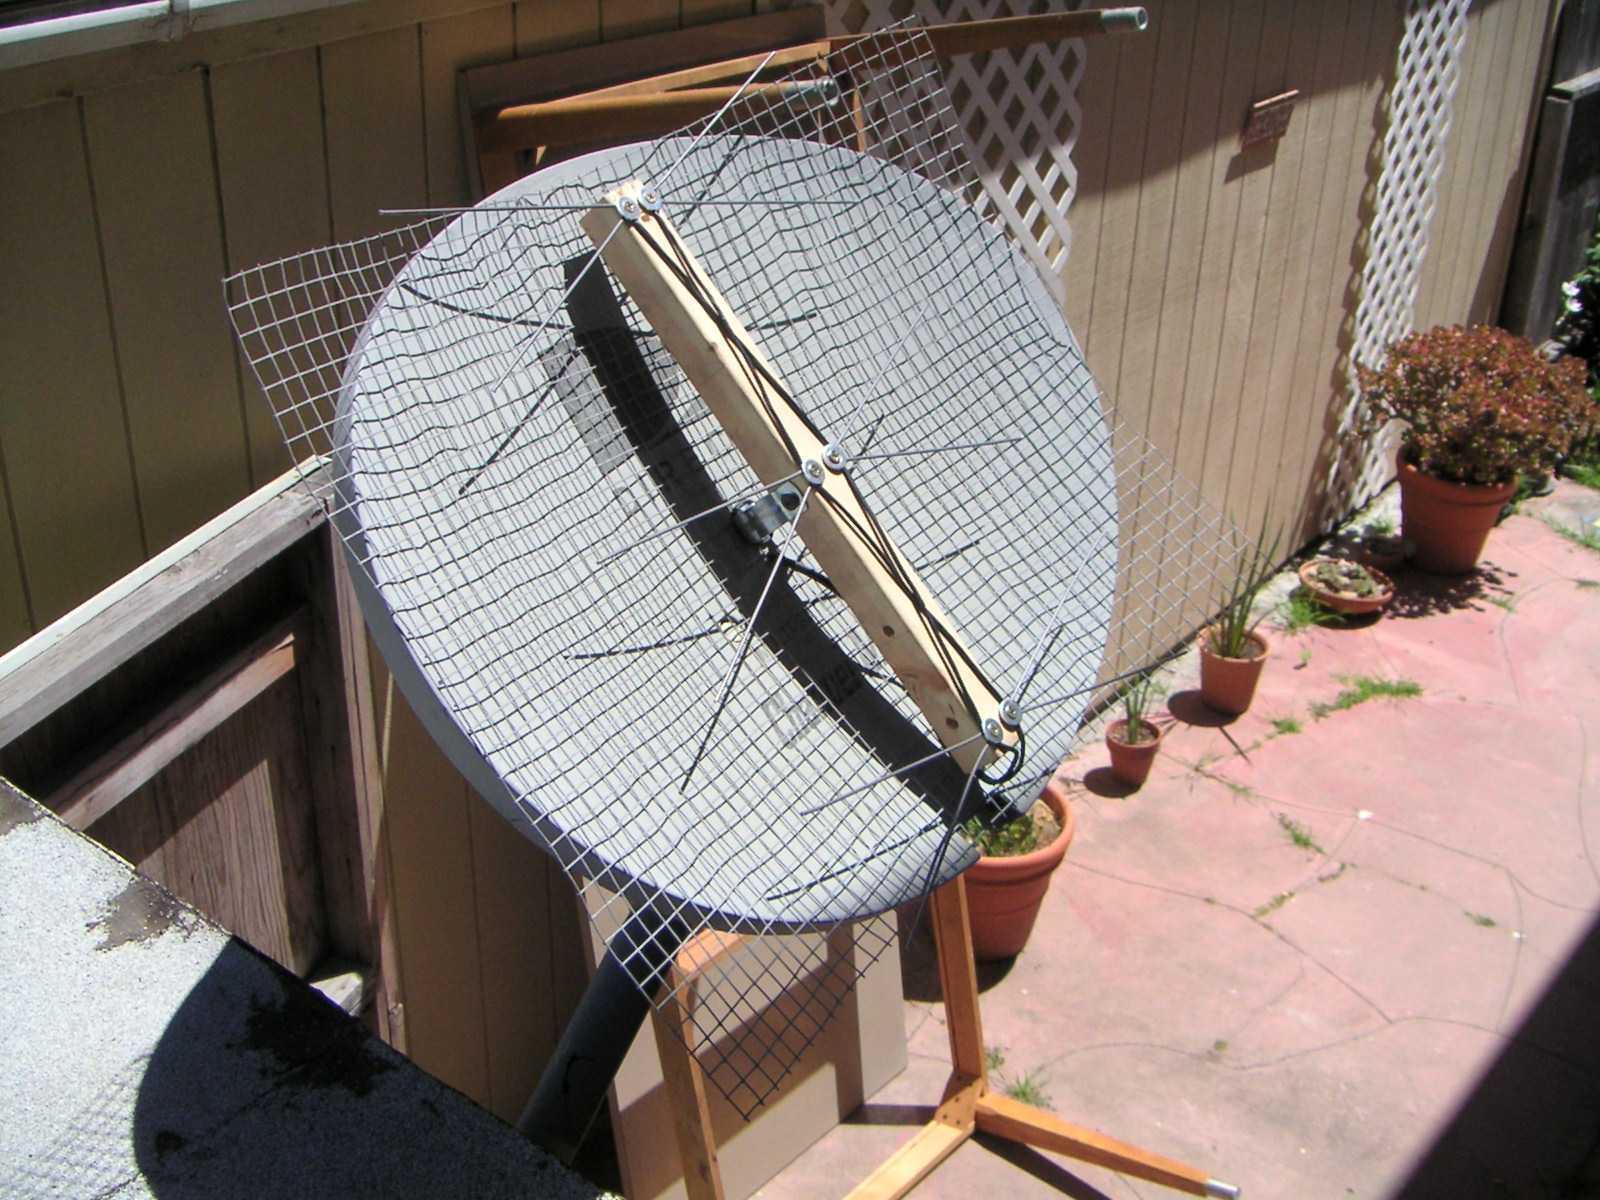 HDTv Antenna on a Direct TV mount.